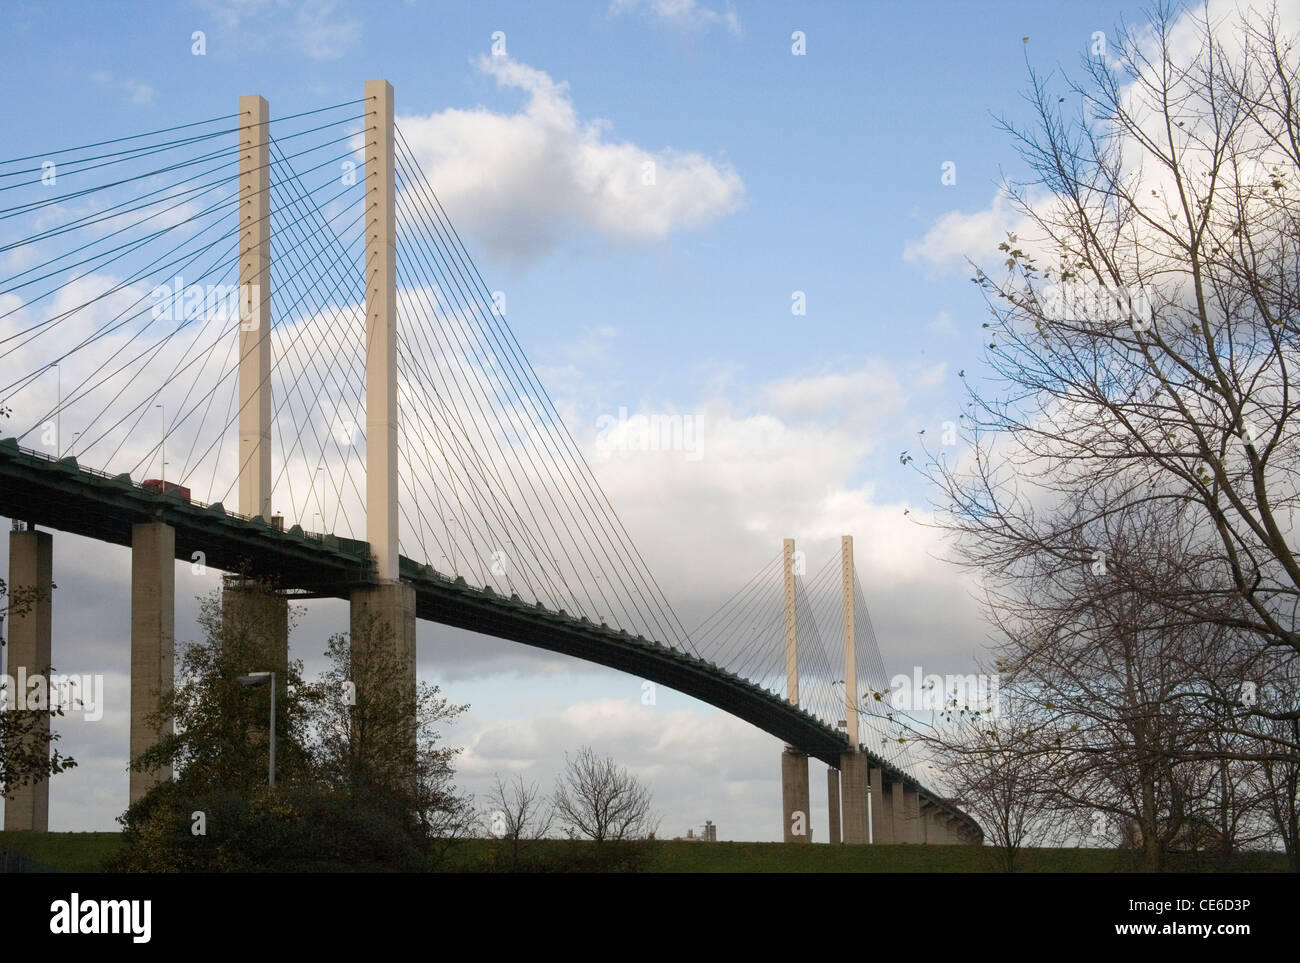 dartford river crossing the QE2 bridge - Stock Image